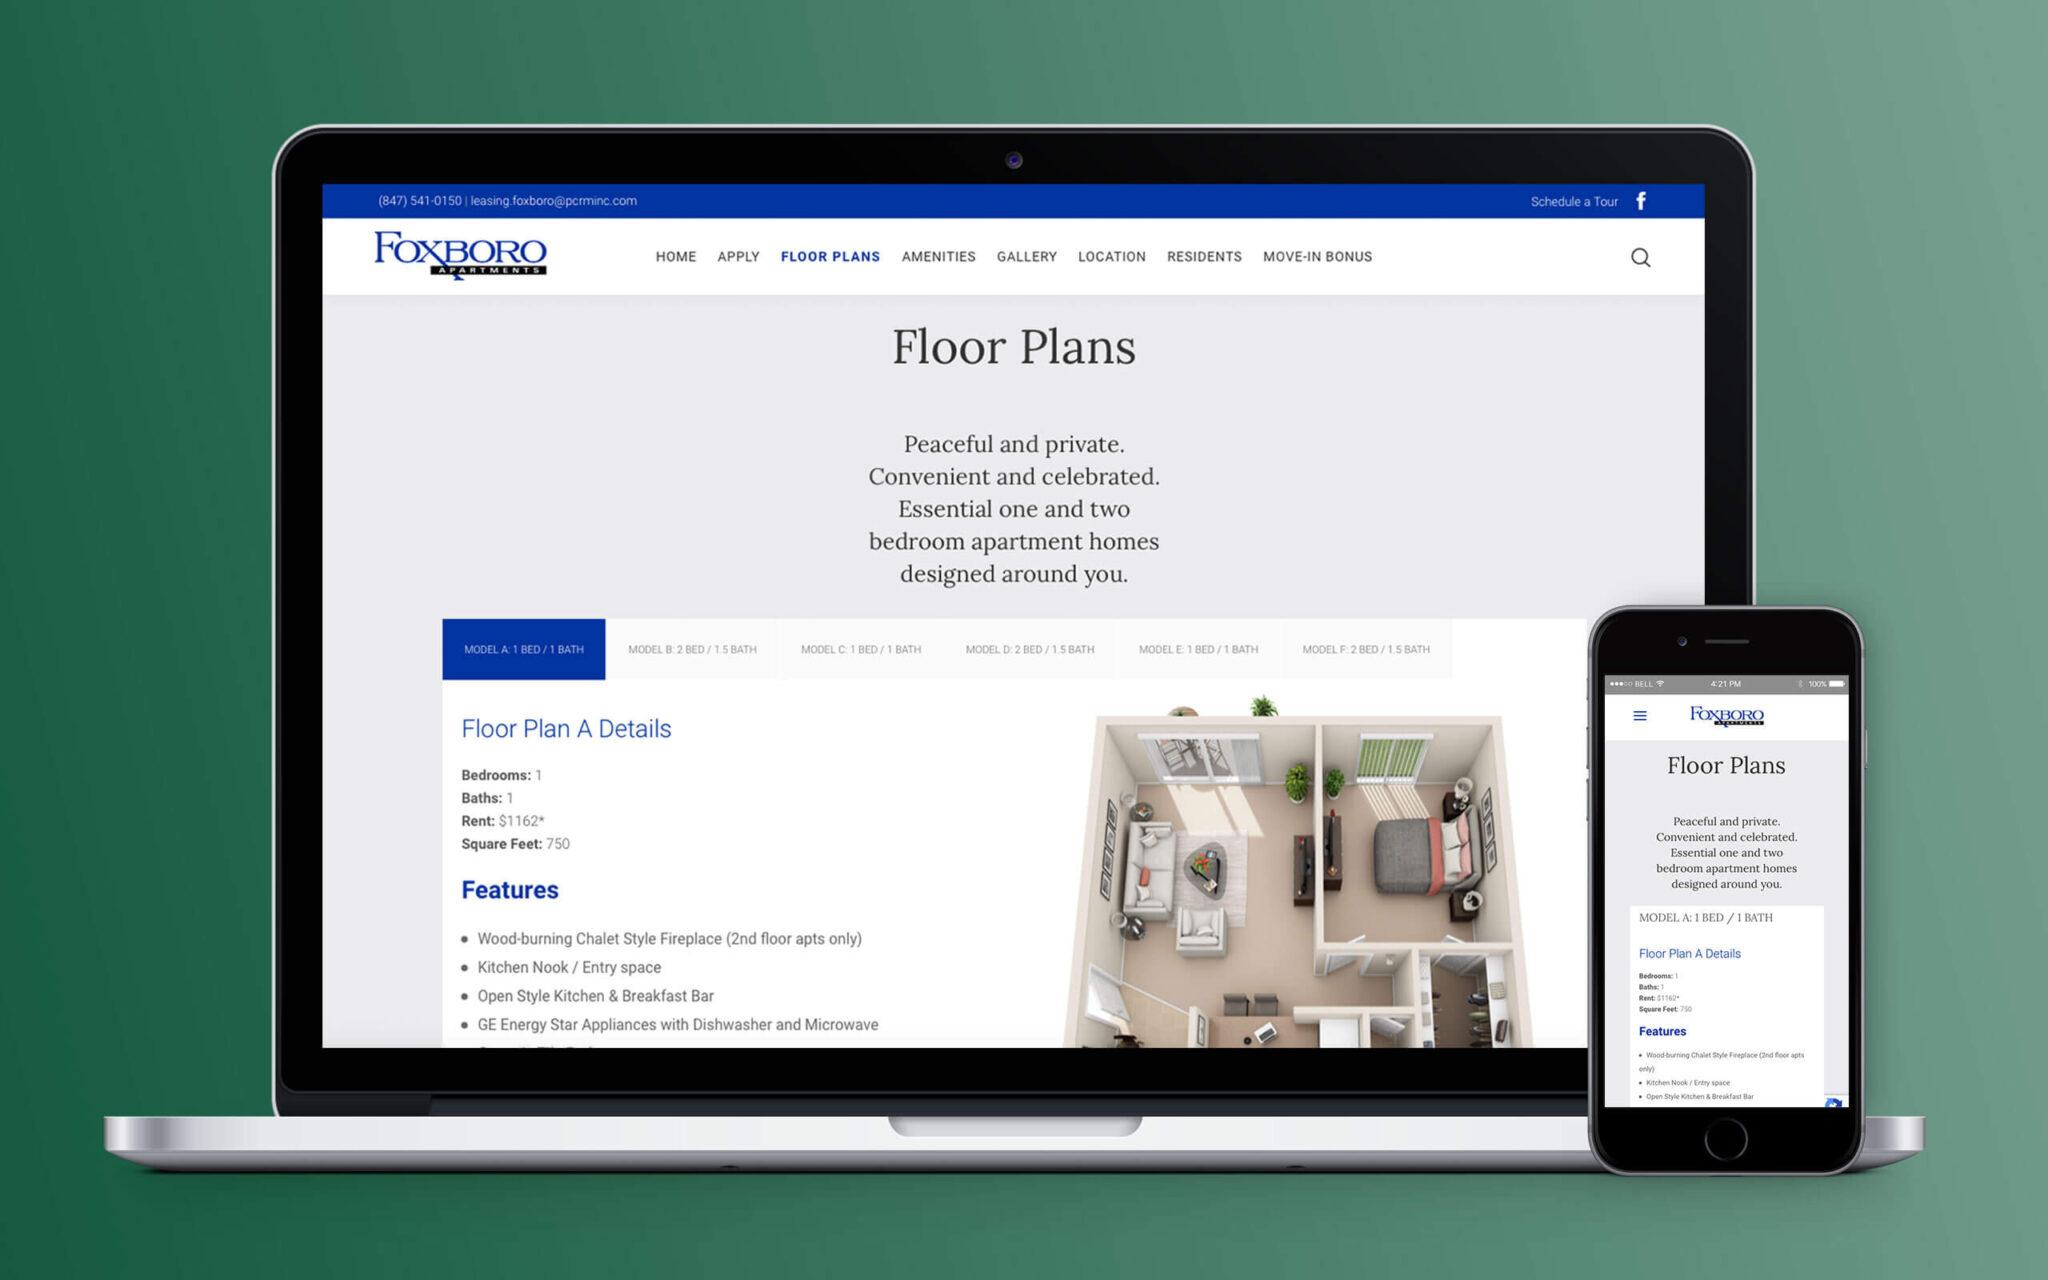 Foxboro Apartments Website Floor Plans